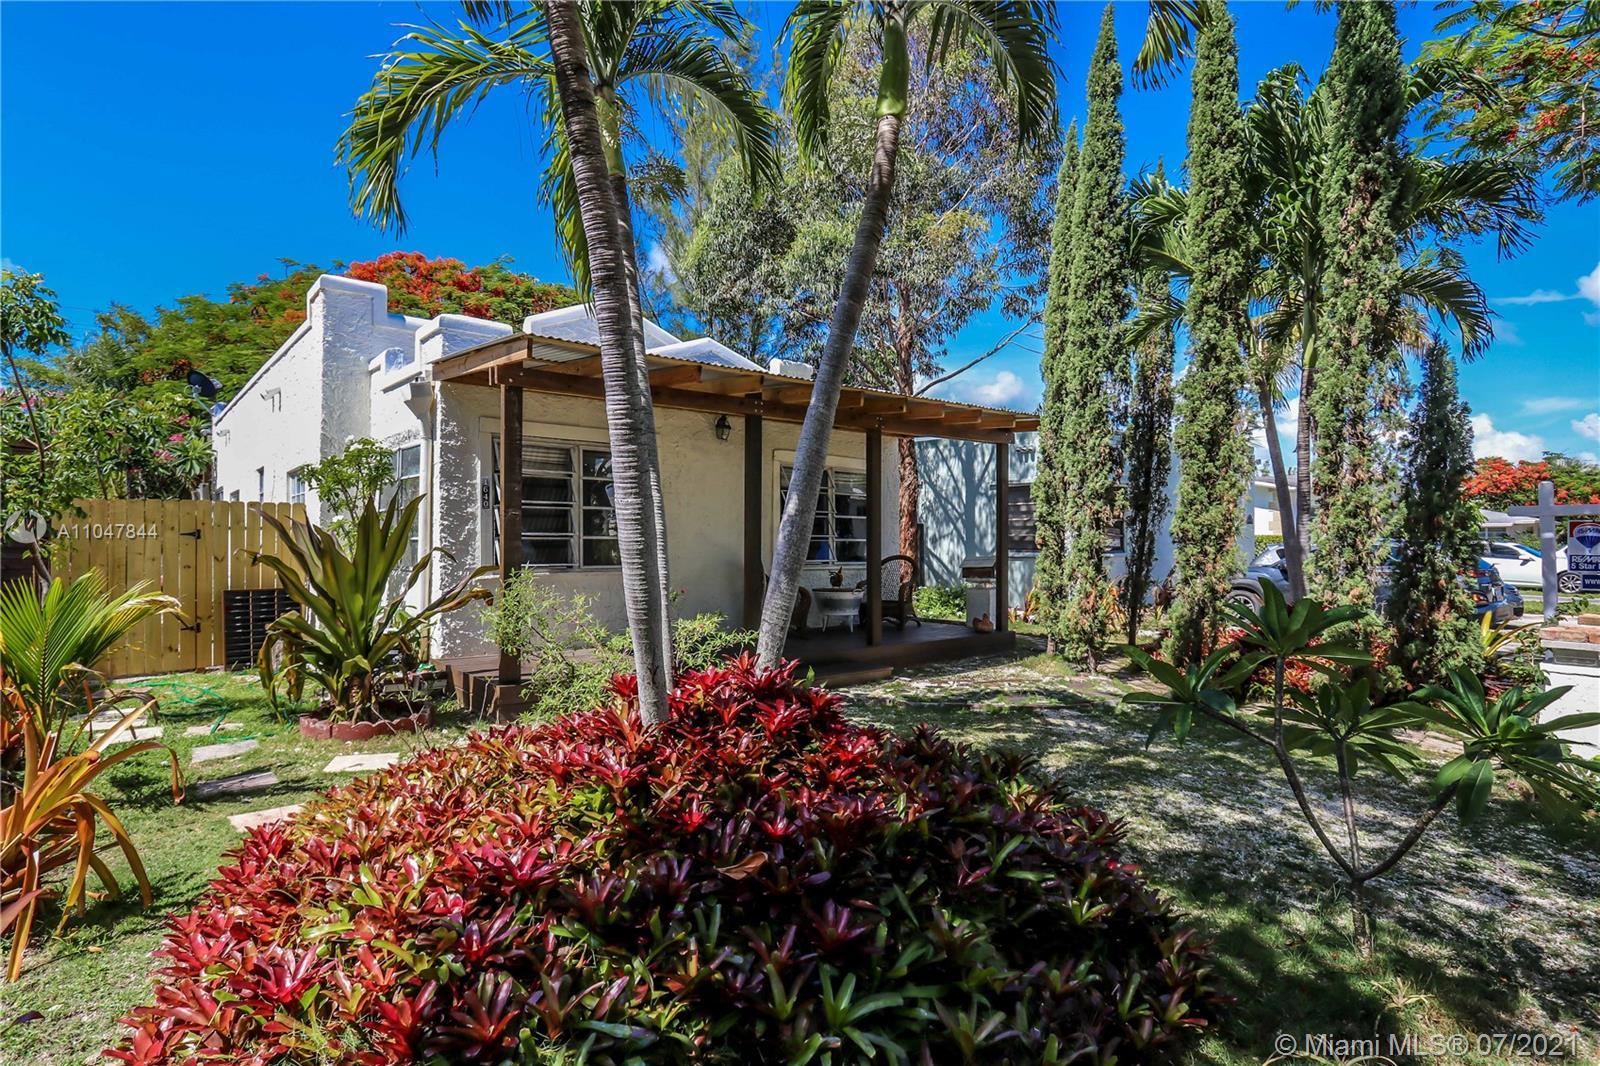 Sunset Trails - 1640 Funston St, Hollywood, FL 33020